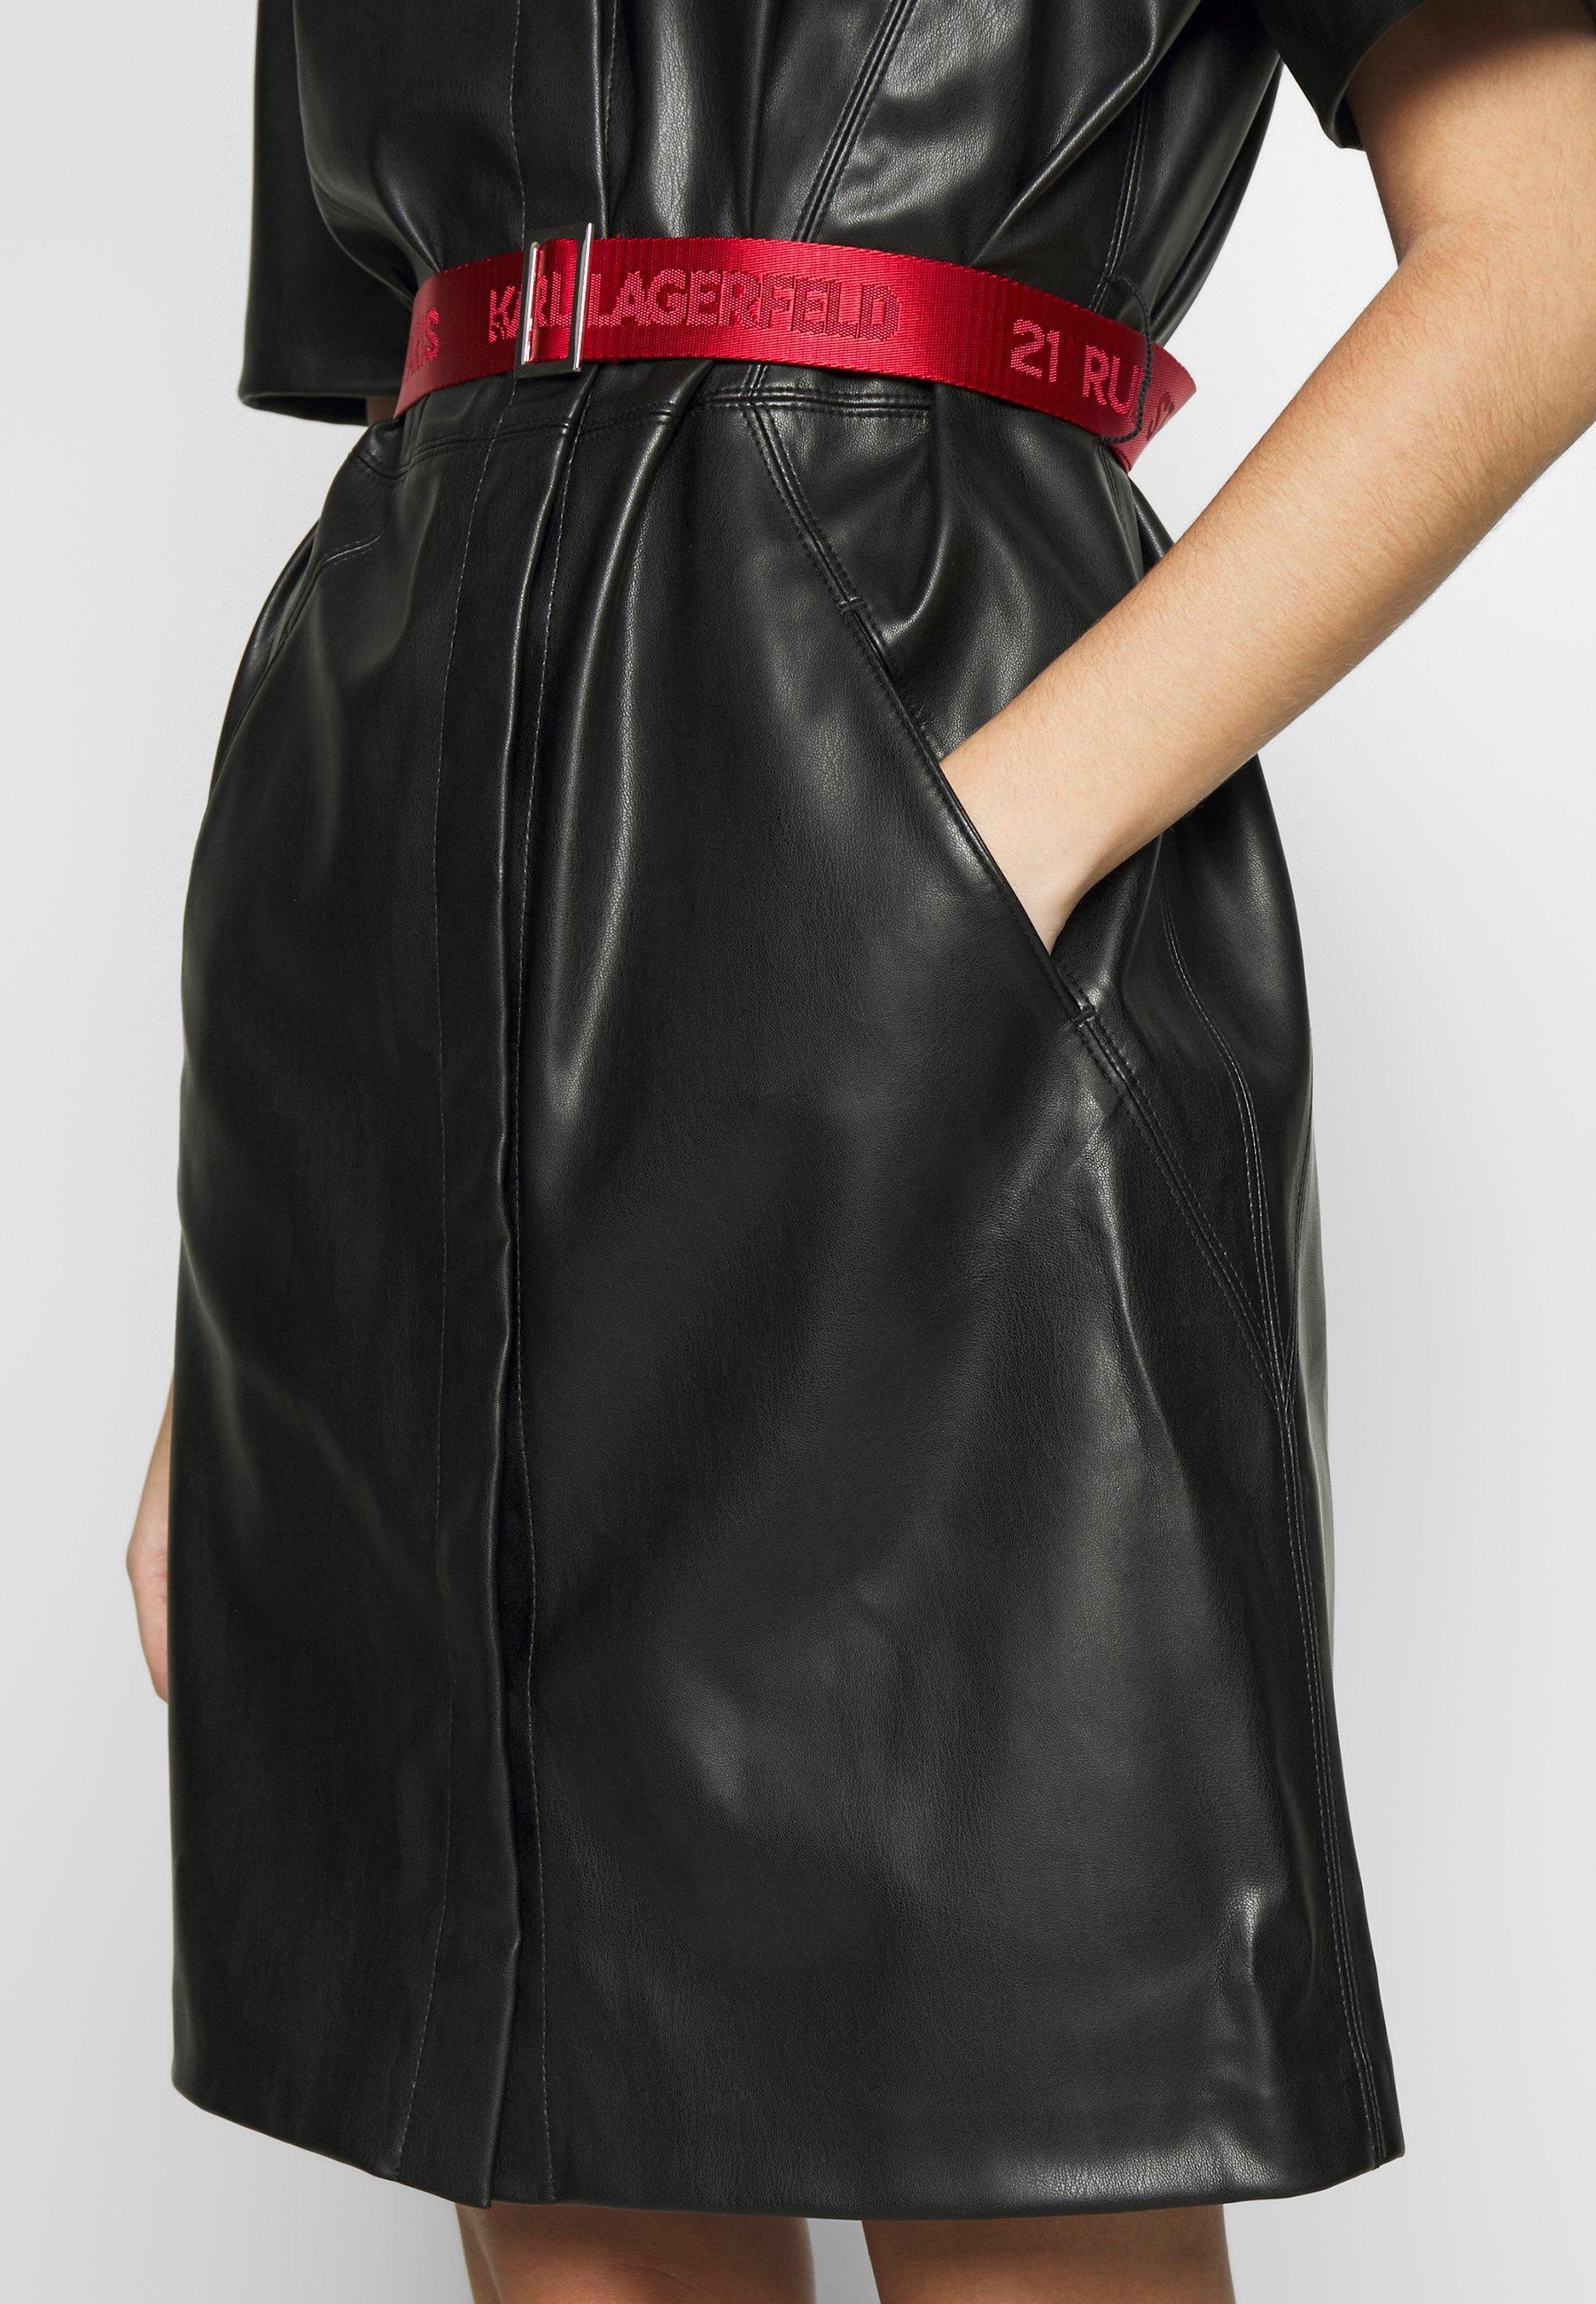 Karl Lagerfeld Shirt Dress - Cocktail / Party Black